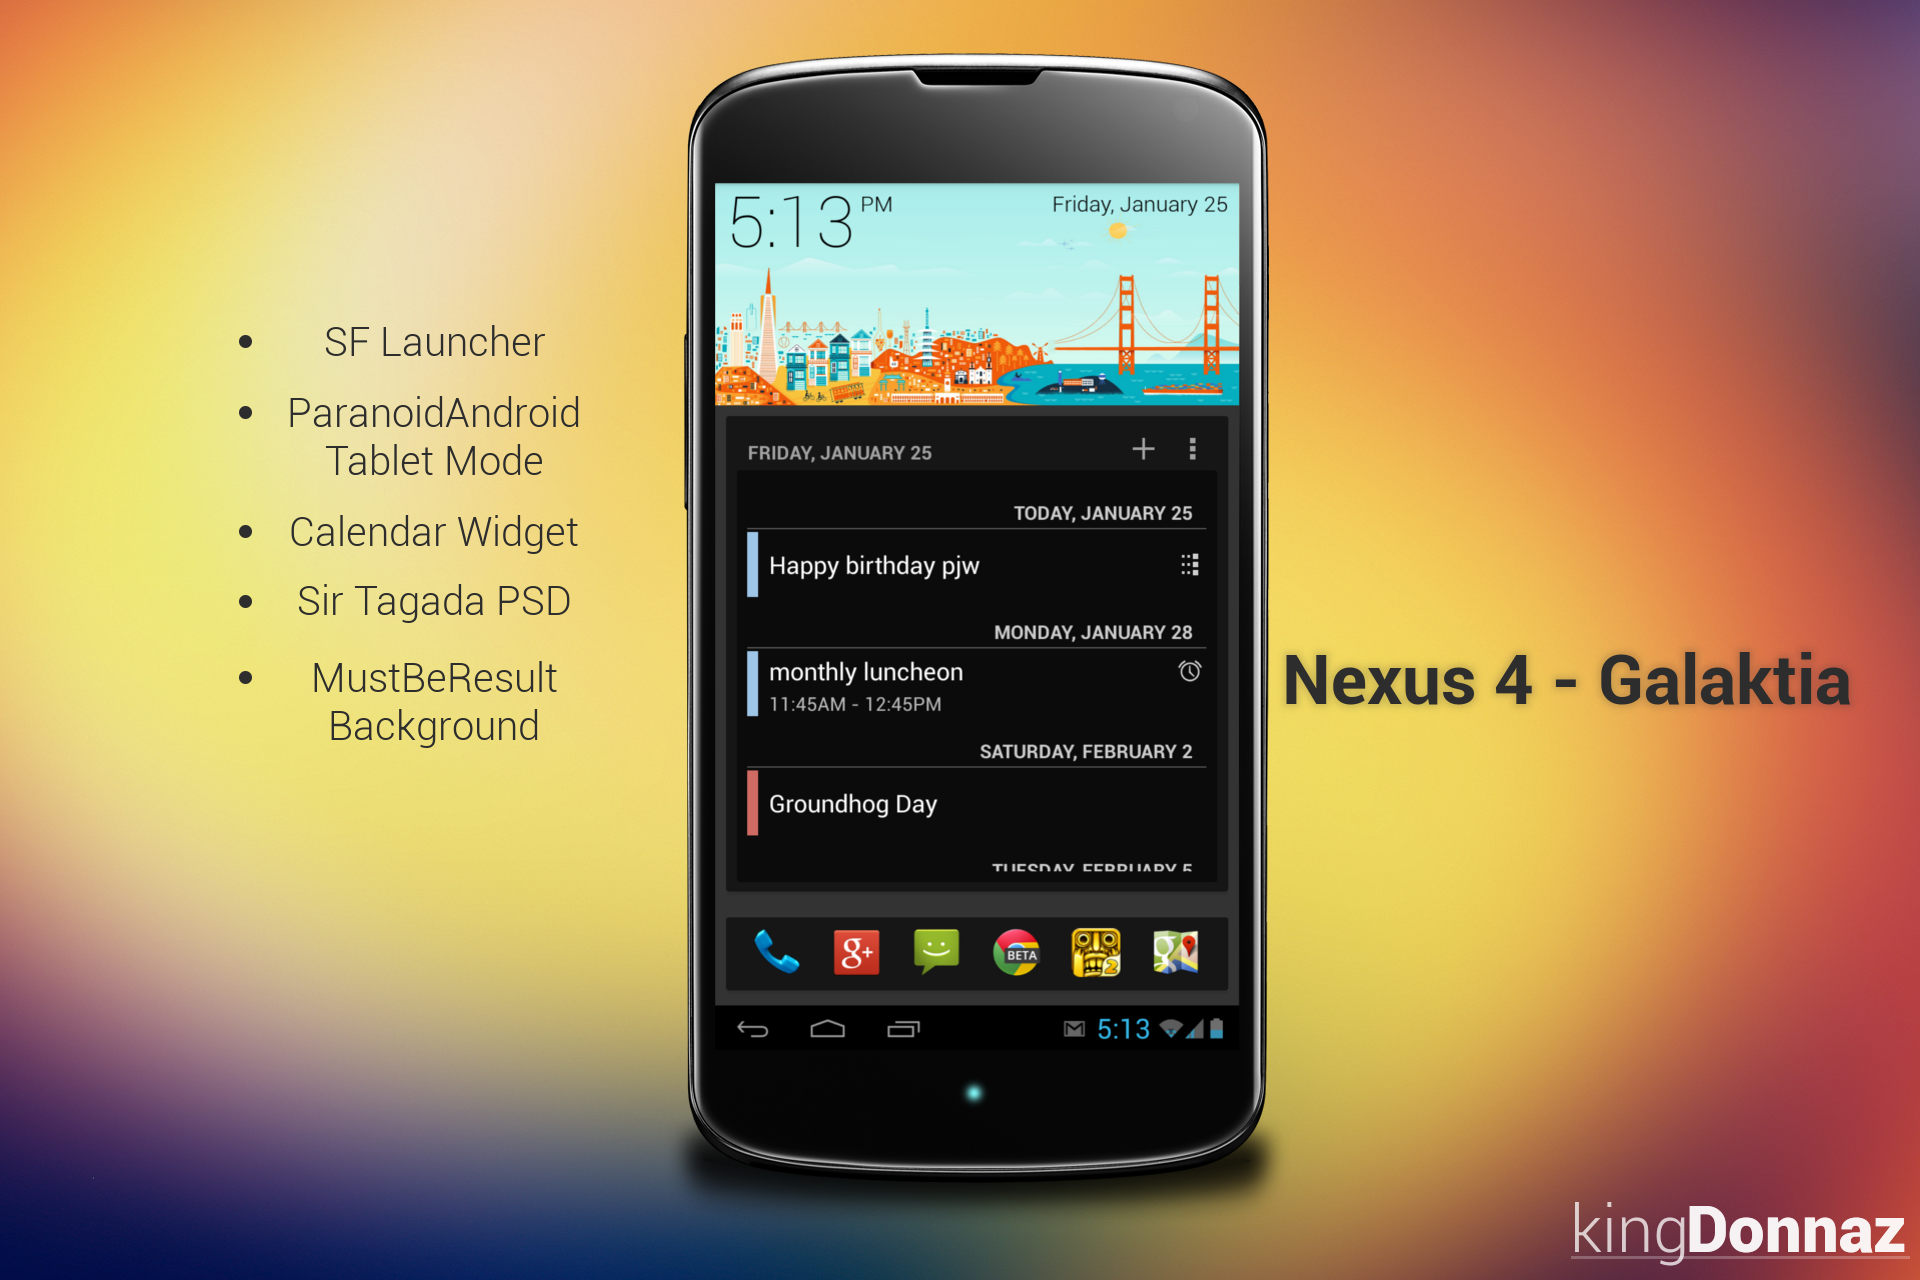 Nexus 4 - Galaktia by kingdonnaz